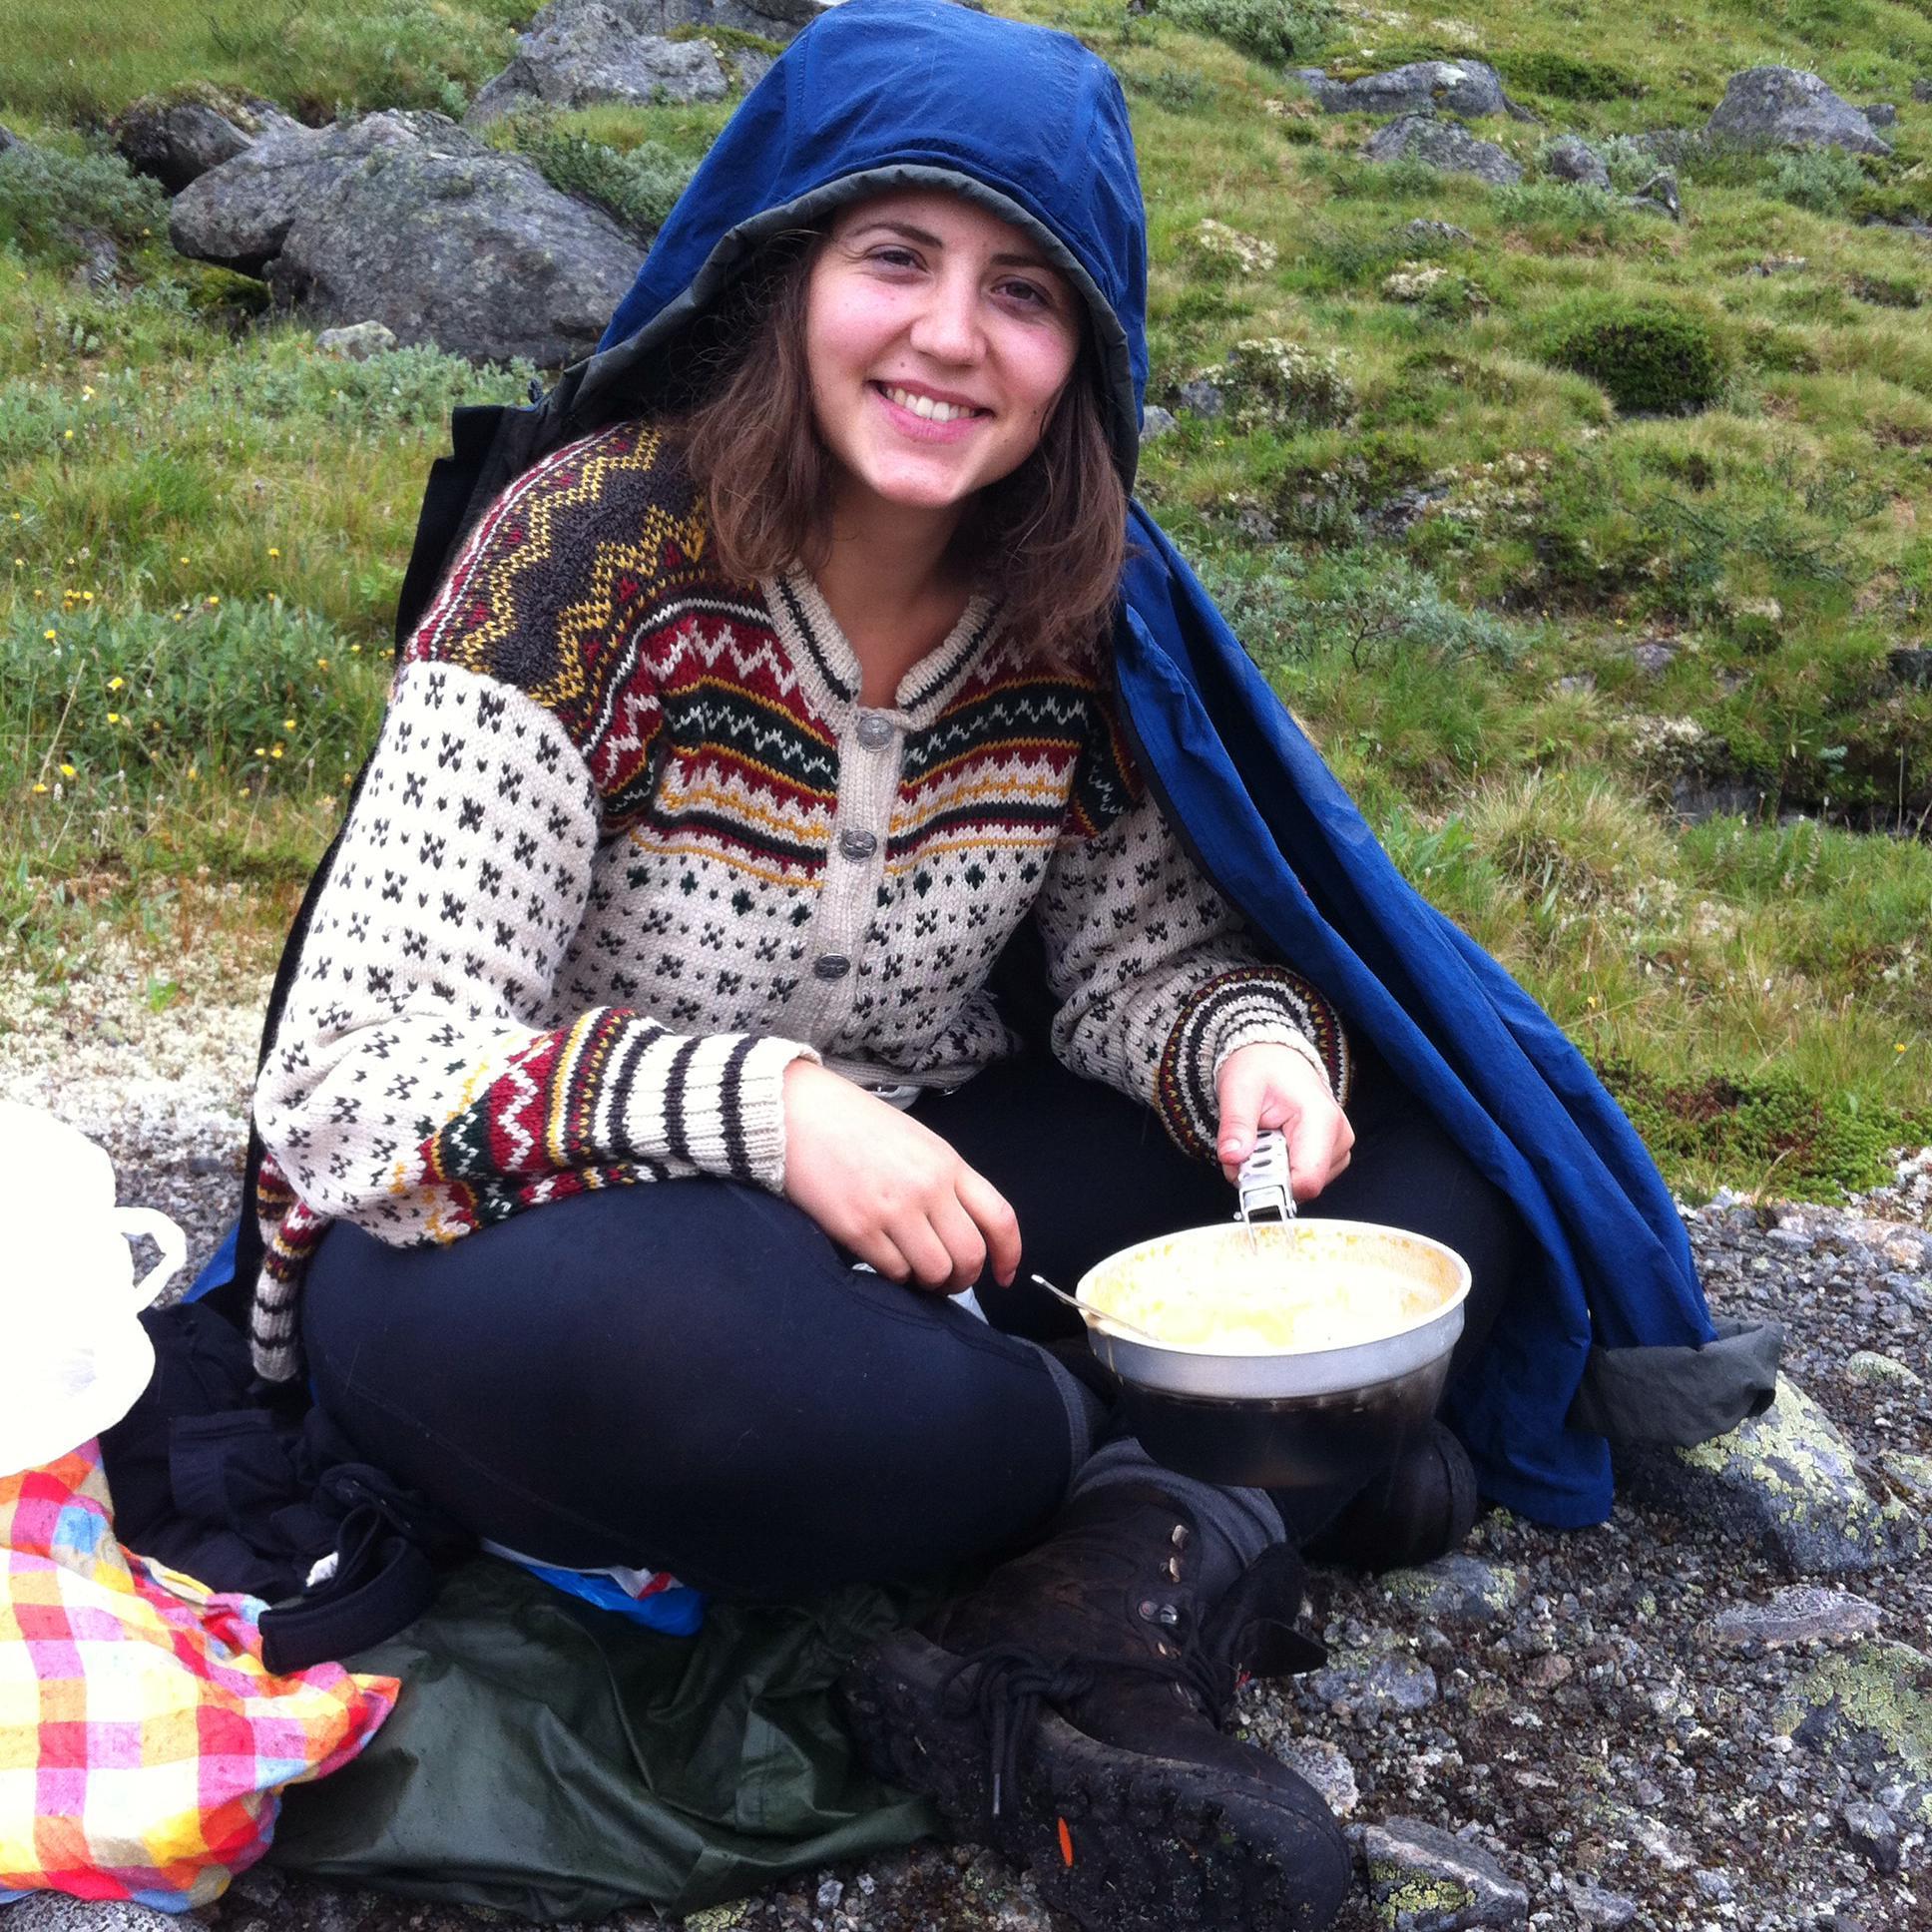 Straume: Ny dagleg leiar i Kringkastingsringen